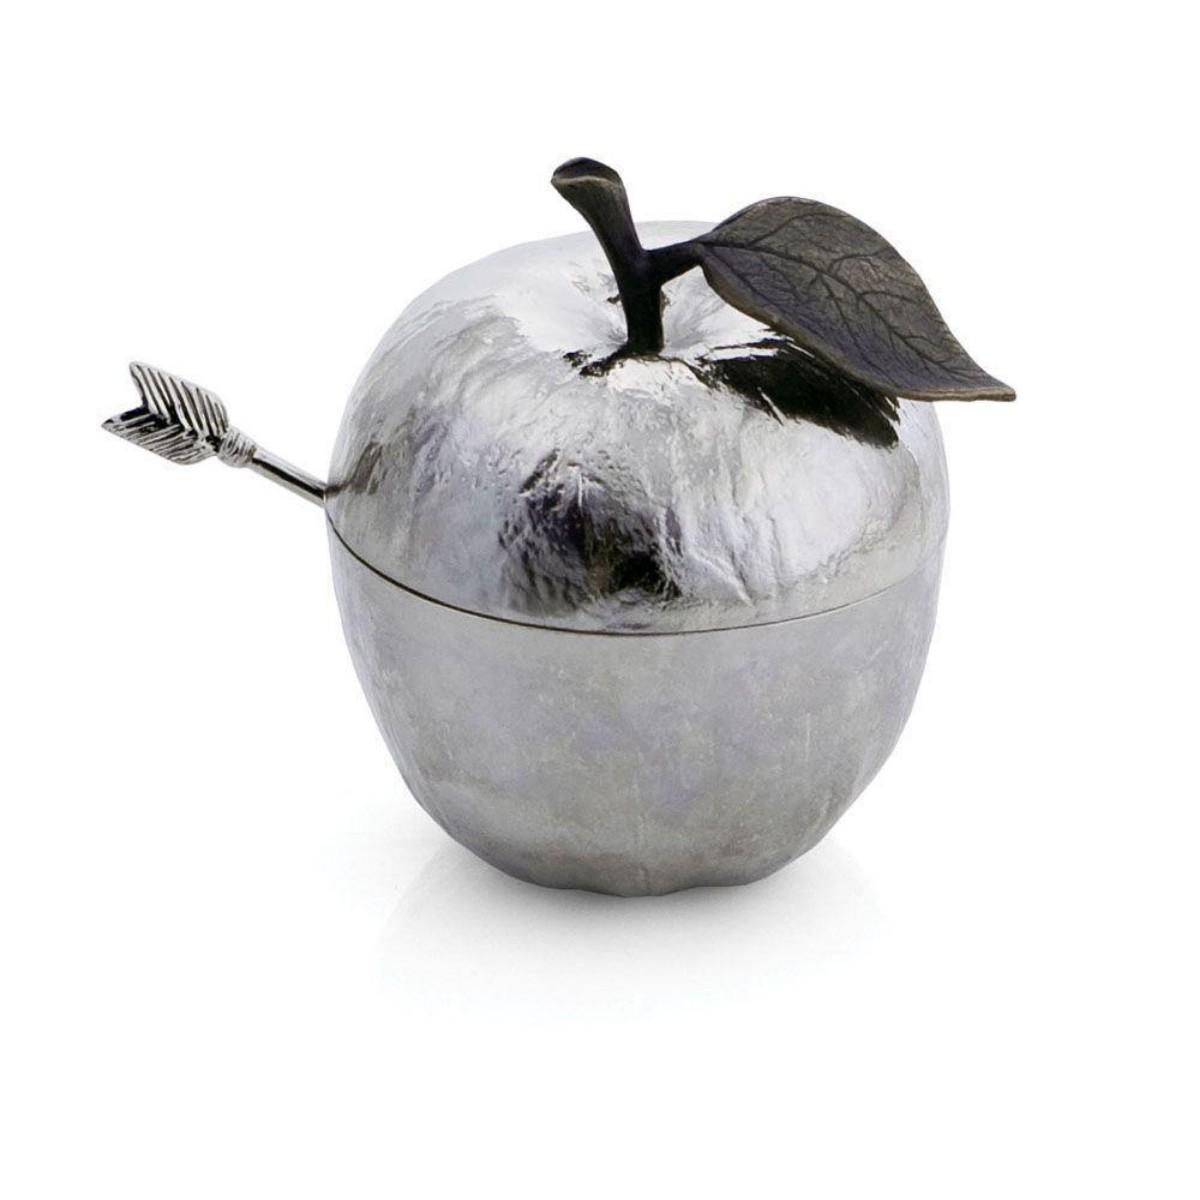 Michael Aram I Apple Honey Pot w/ Spoon I Nickelplate